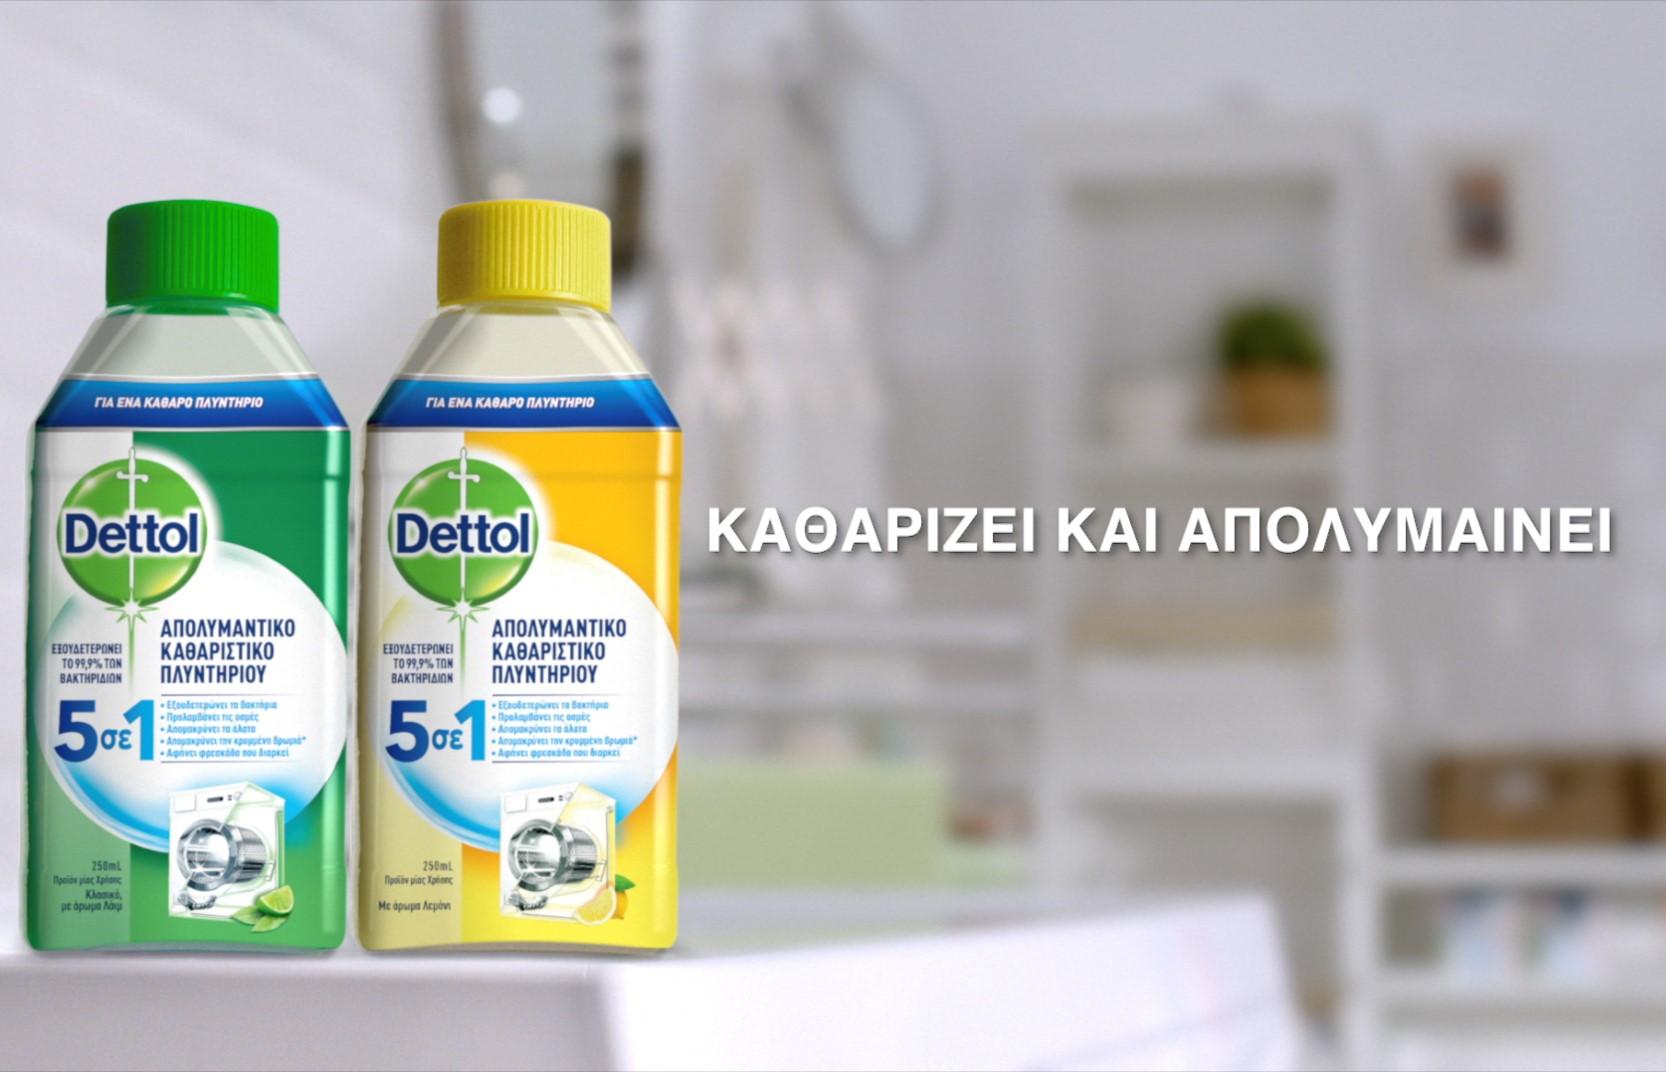 DETTOL Απολυμαντικό Καθαριστικό Πλυντηρίου Ρούχων: 12€ για 2 συσκευασίες Classic ή Lemon 250ml που εξουδετερώνουν το 99,9% των μικροβίων! H Καλύτερη τιμή της αγοράς!